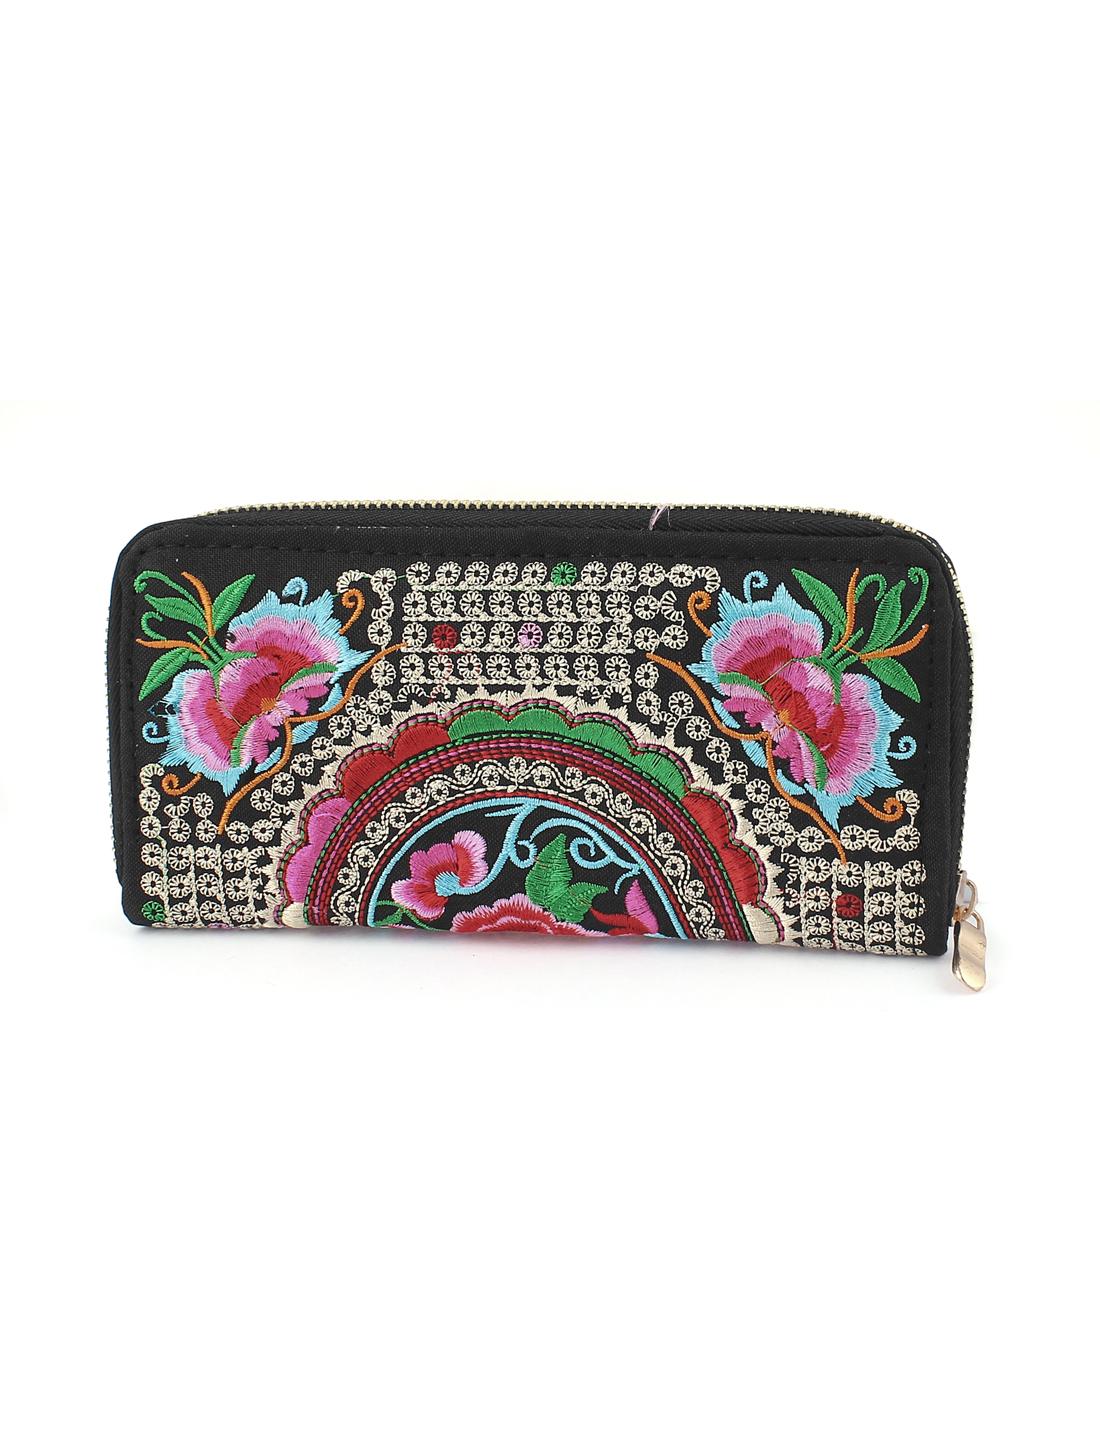 Lady Women Embroider Zip Purse Wallet Clutch Phone Coin Bag Handbag